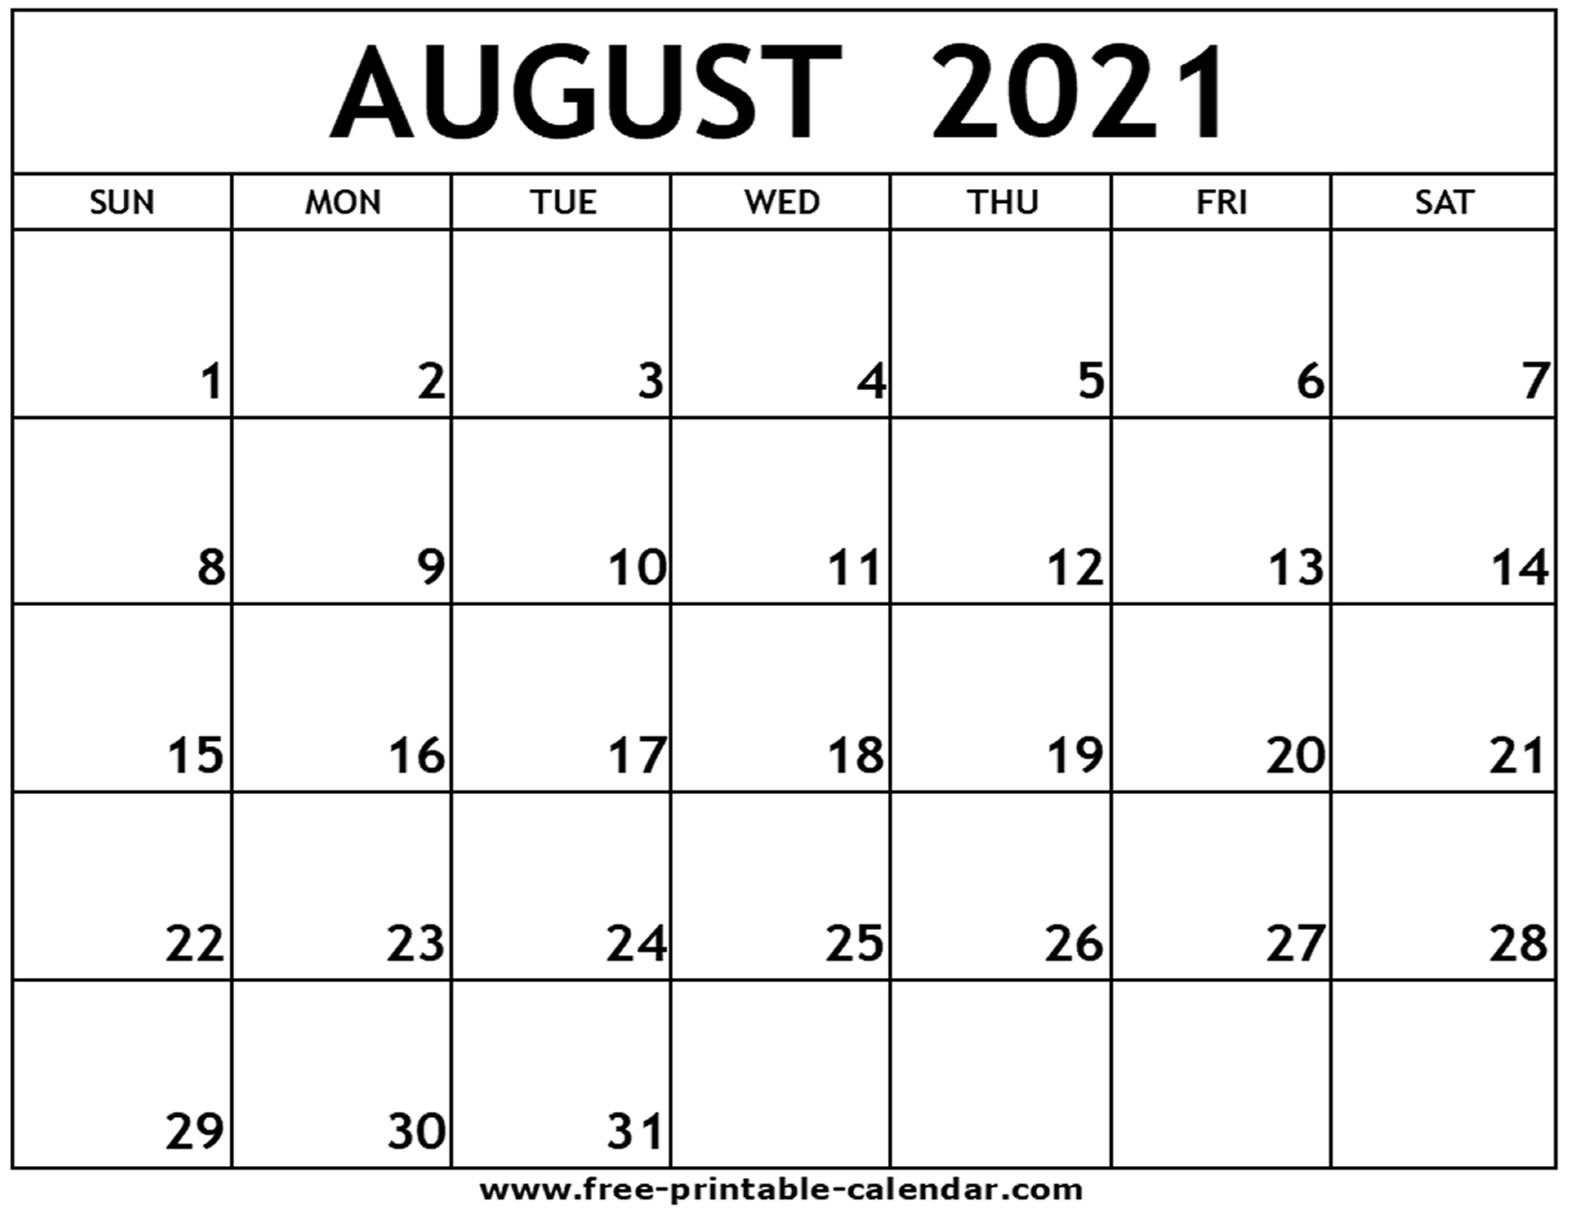 August 2021 Printable Calendar - Free-Printable-Calendar August 2021 Calendar Print